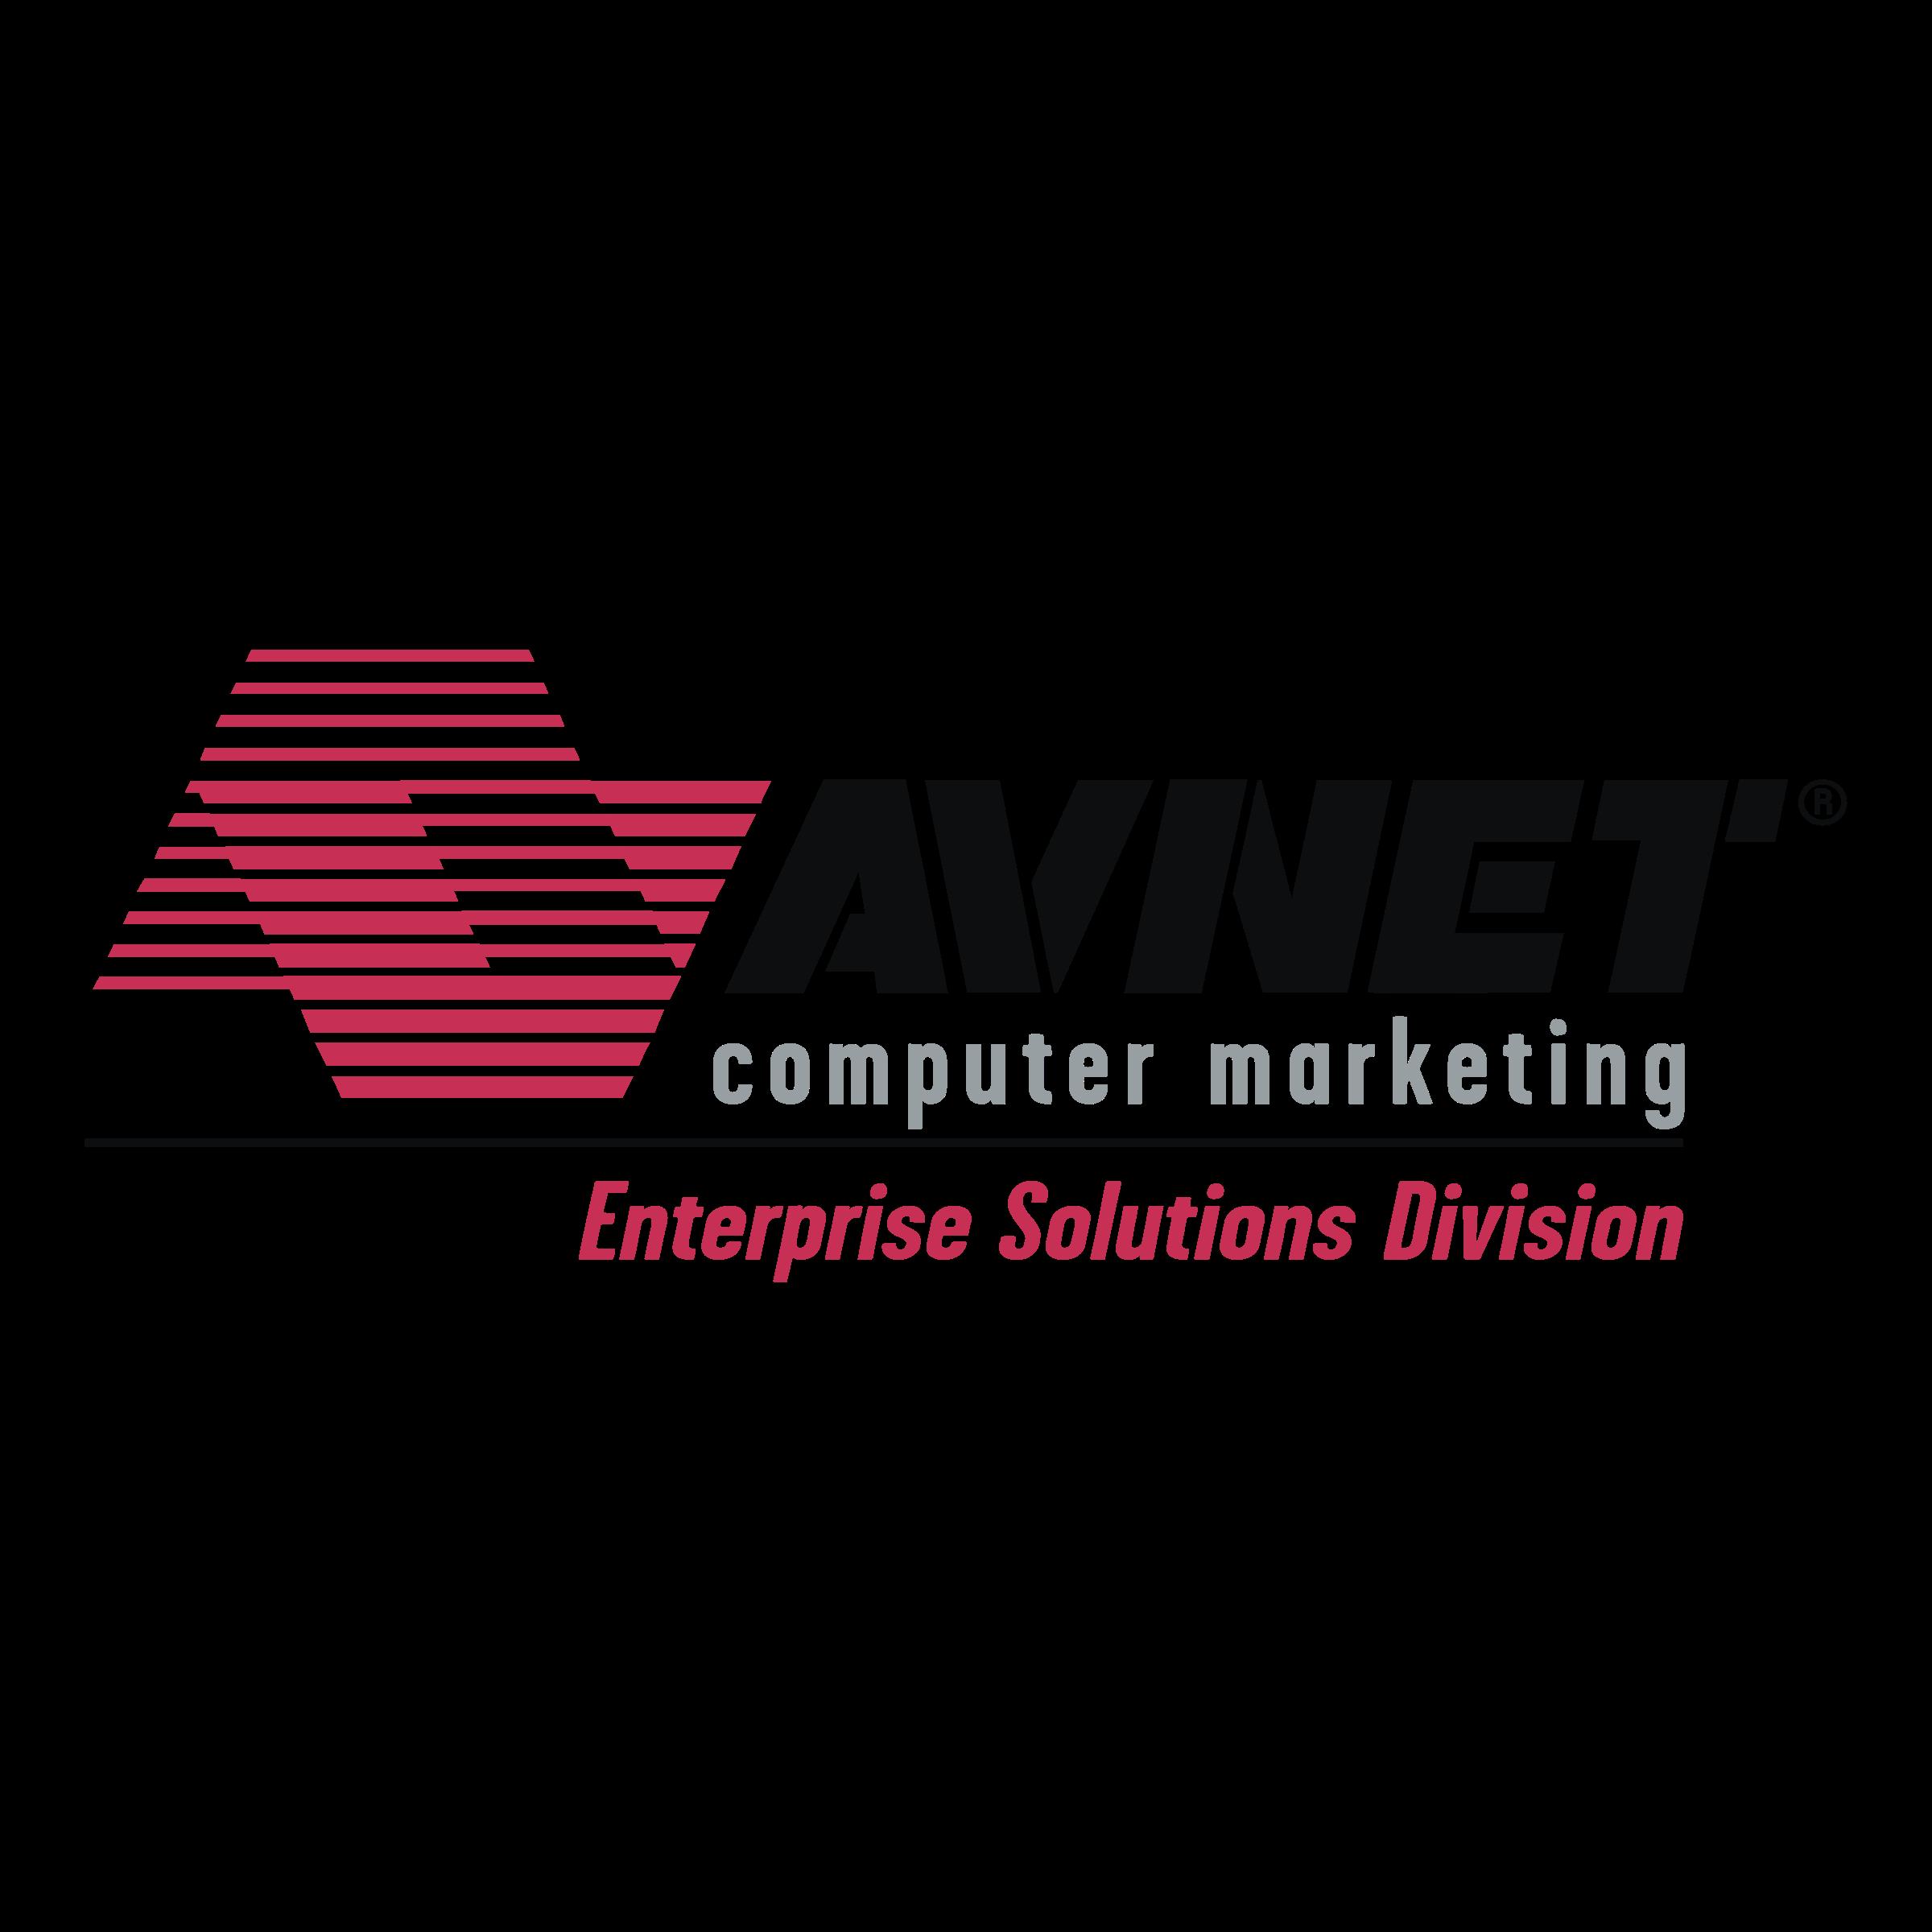 Avnet Logo Png Transparent & Svg Vector - Pluspng Pluspng.com - Avnet Logo PNG